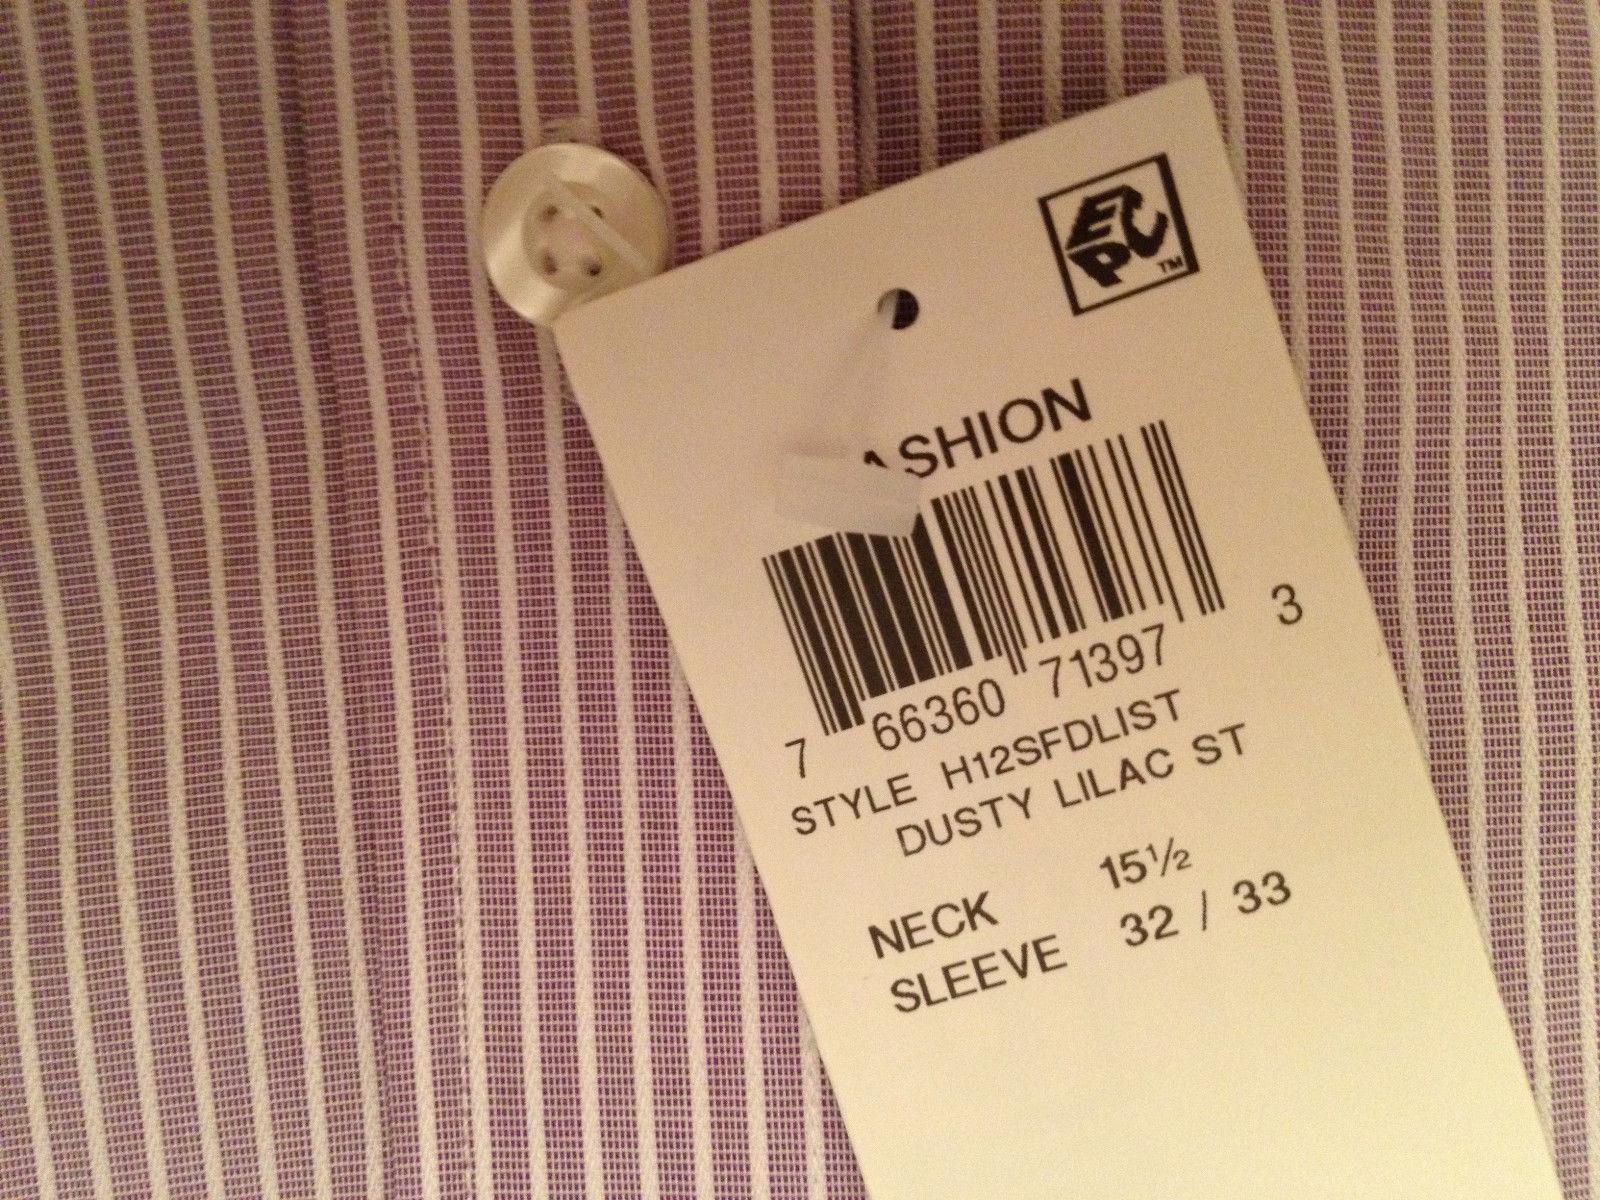 NEW MEN'S Tasso Elba Non Iron Egyptian French Cuff Dress Shirt Lilac 15.5 32/33